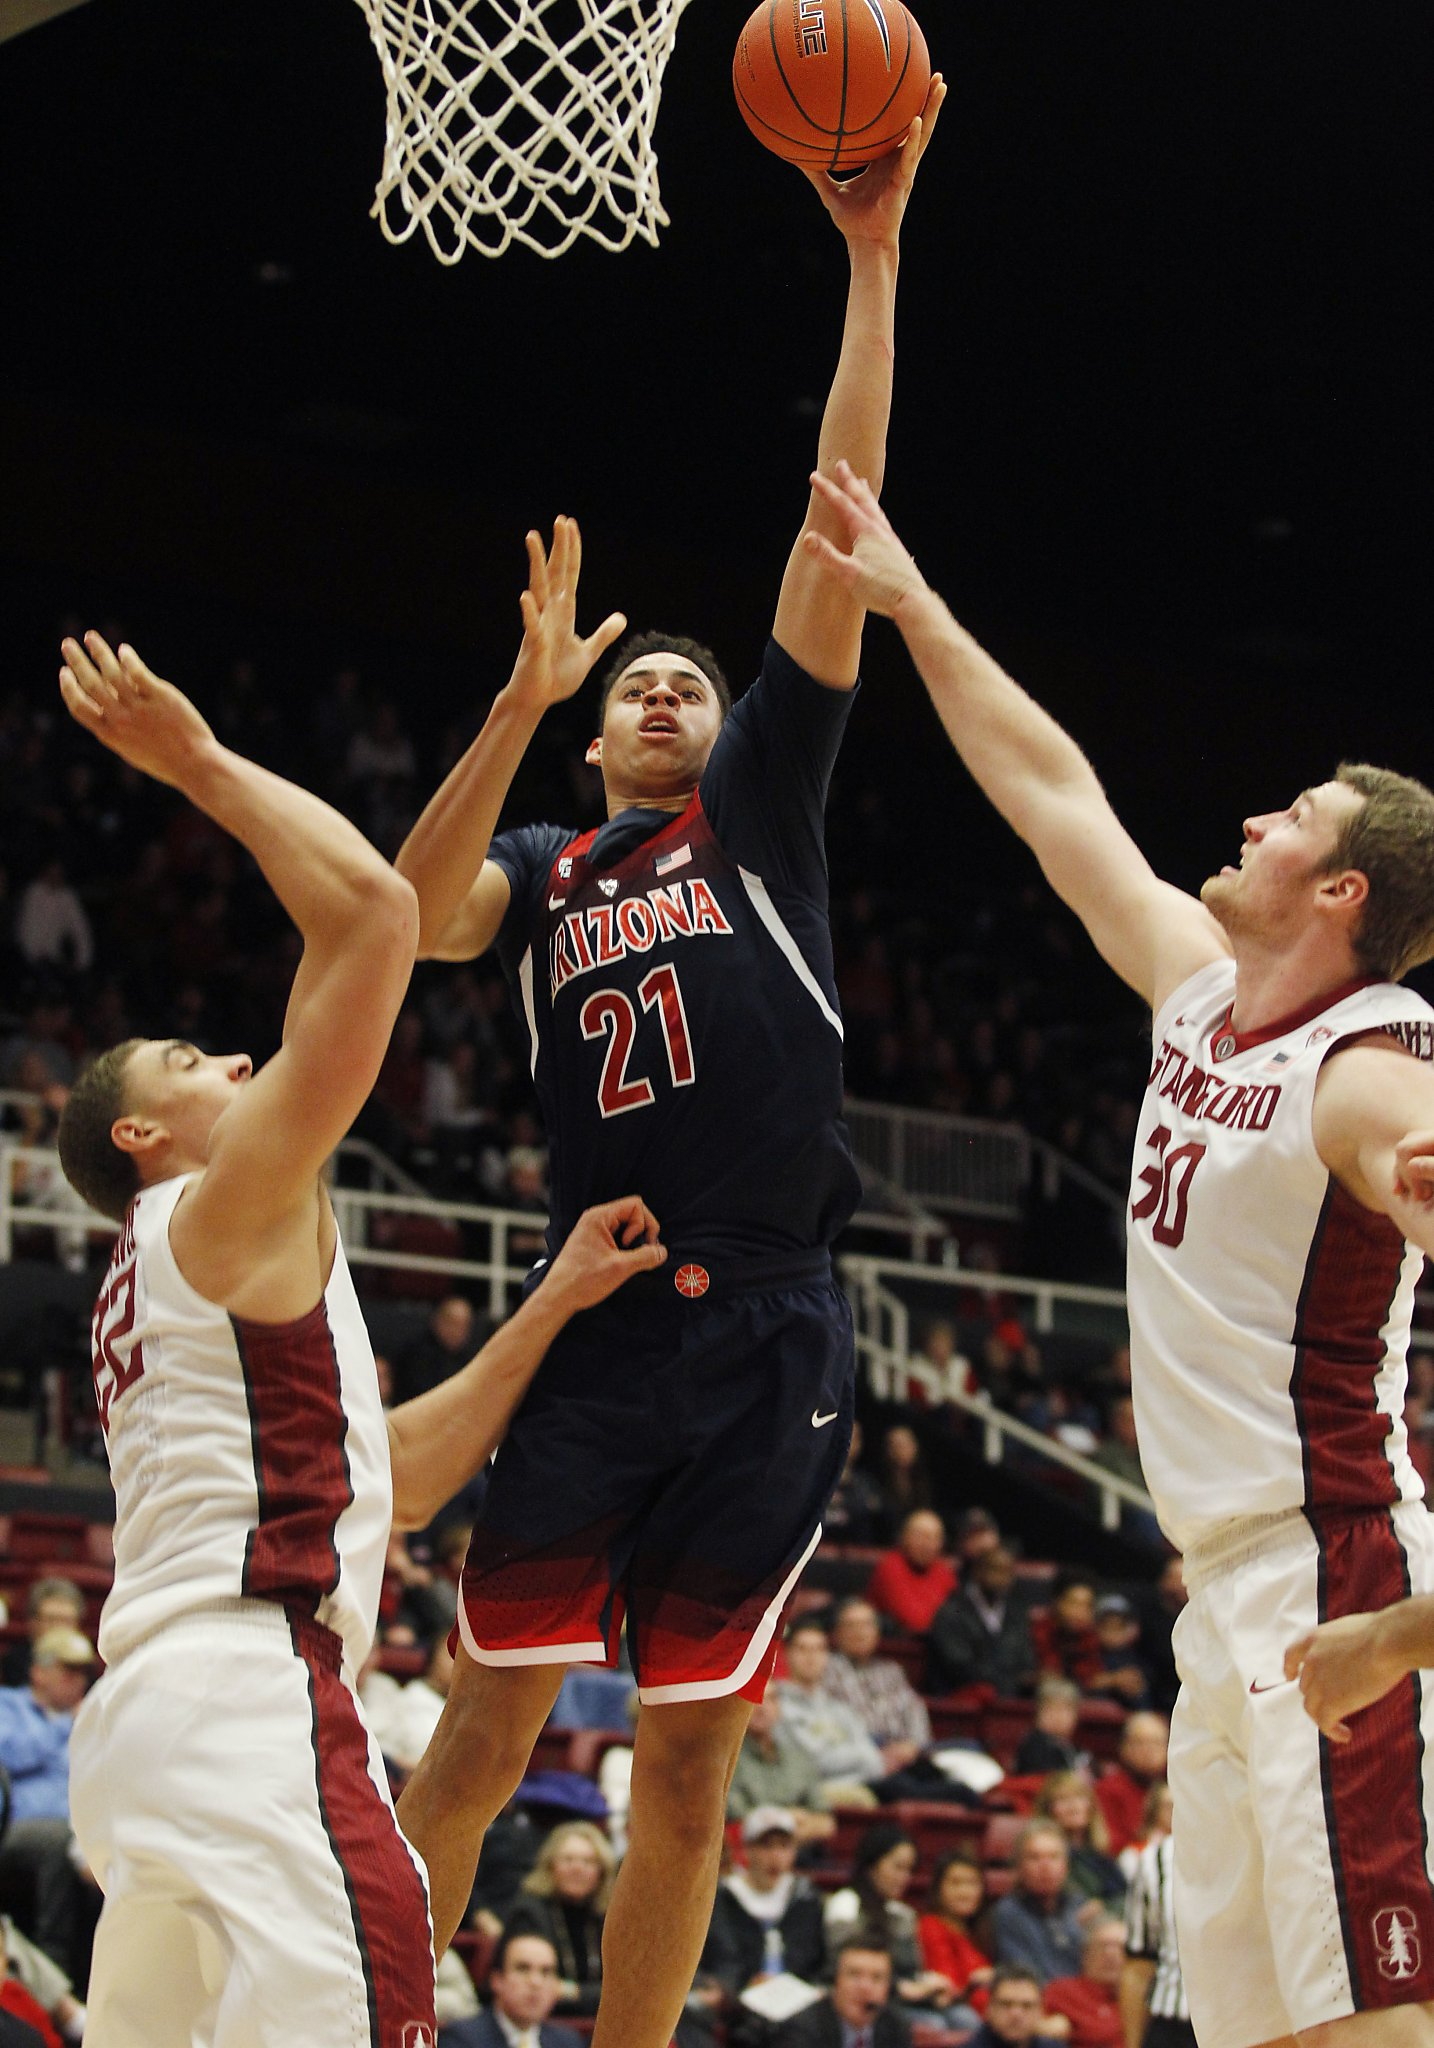 Arizona big men crush Stanford - SFChronicle.com